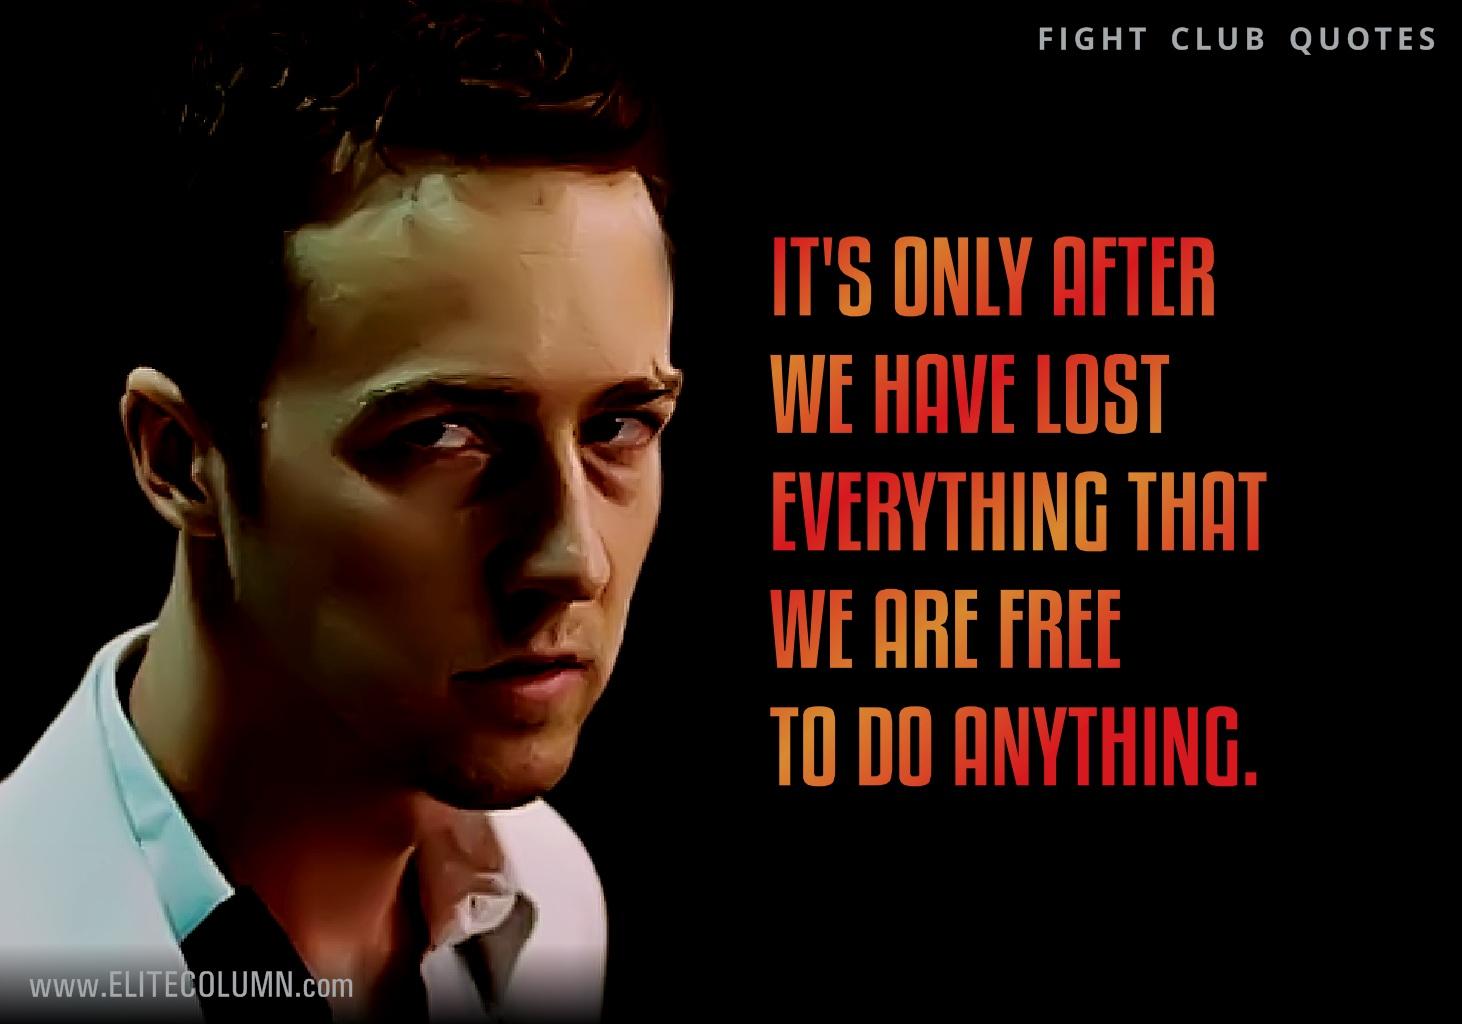 Fight Club Quotes (4)